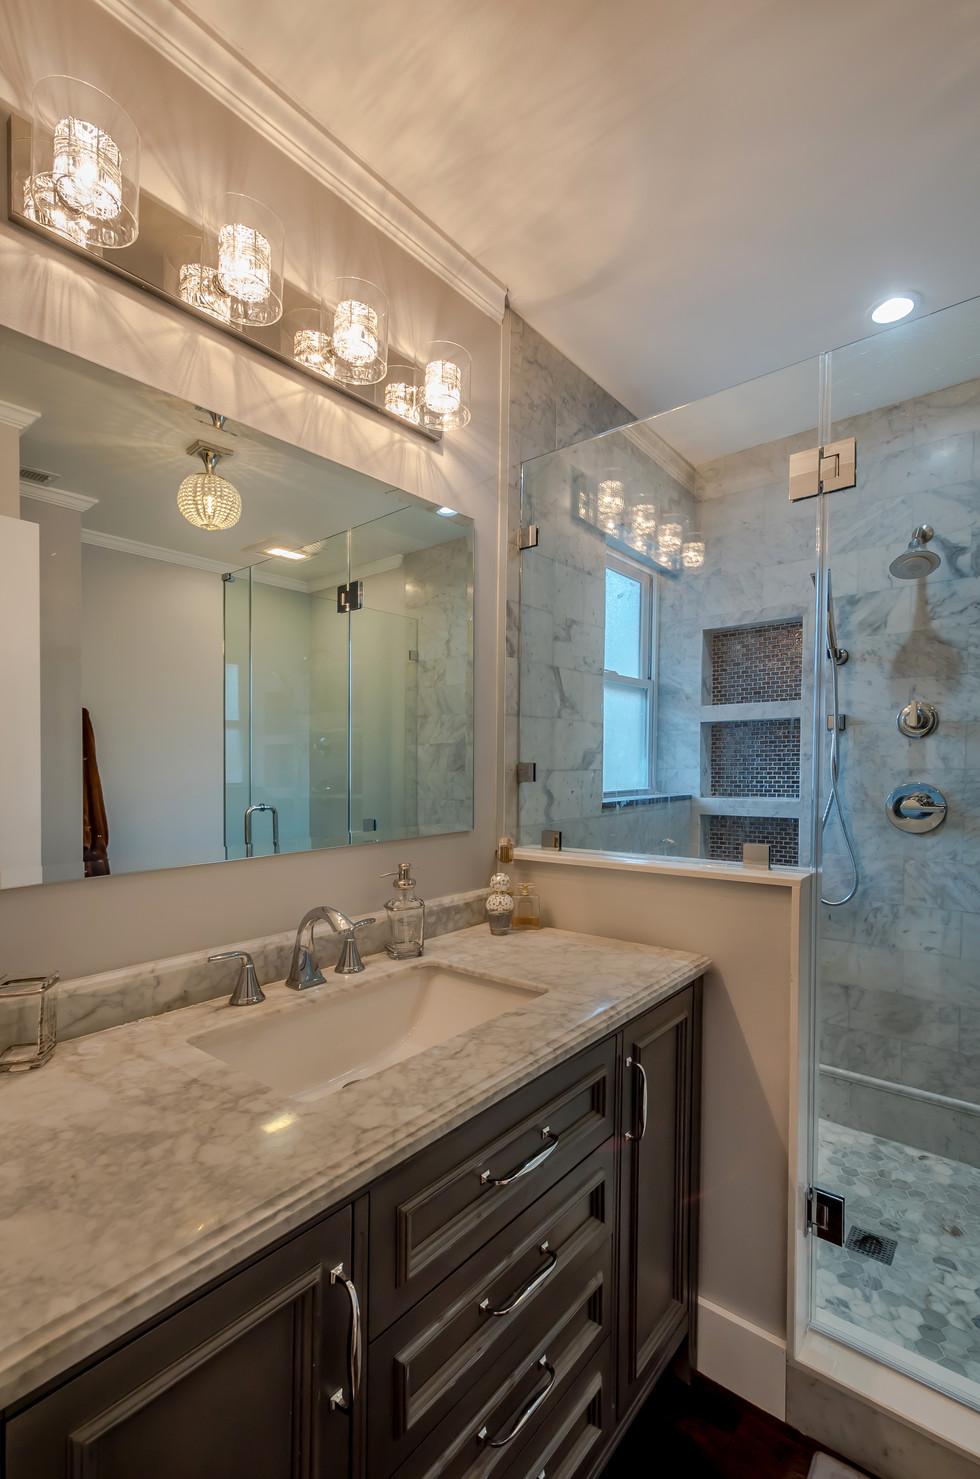 Bathroom Remodel Highlighted By Marble Tile Shower, Custom Shower Niches, Gray Wood Vanity, Marble Countertop & an Elegant Mirror/LED Vanity Lighting Set